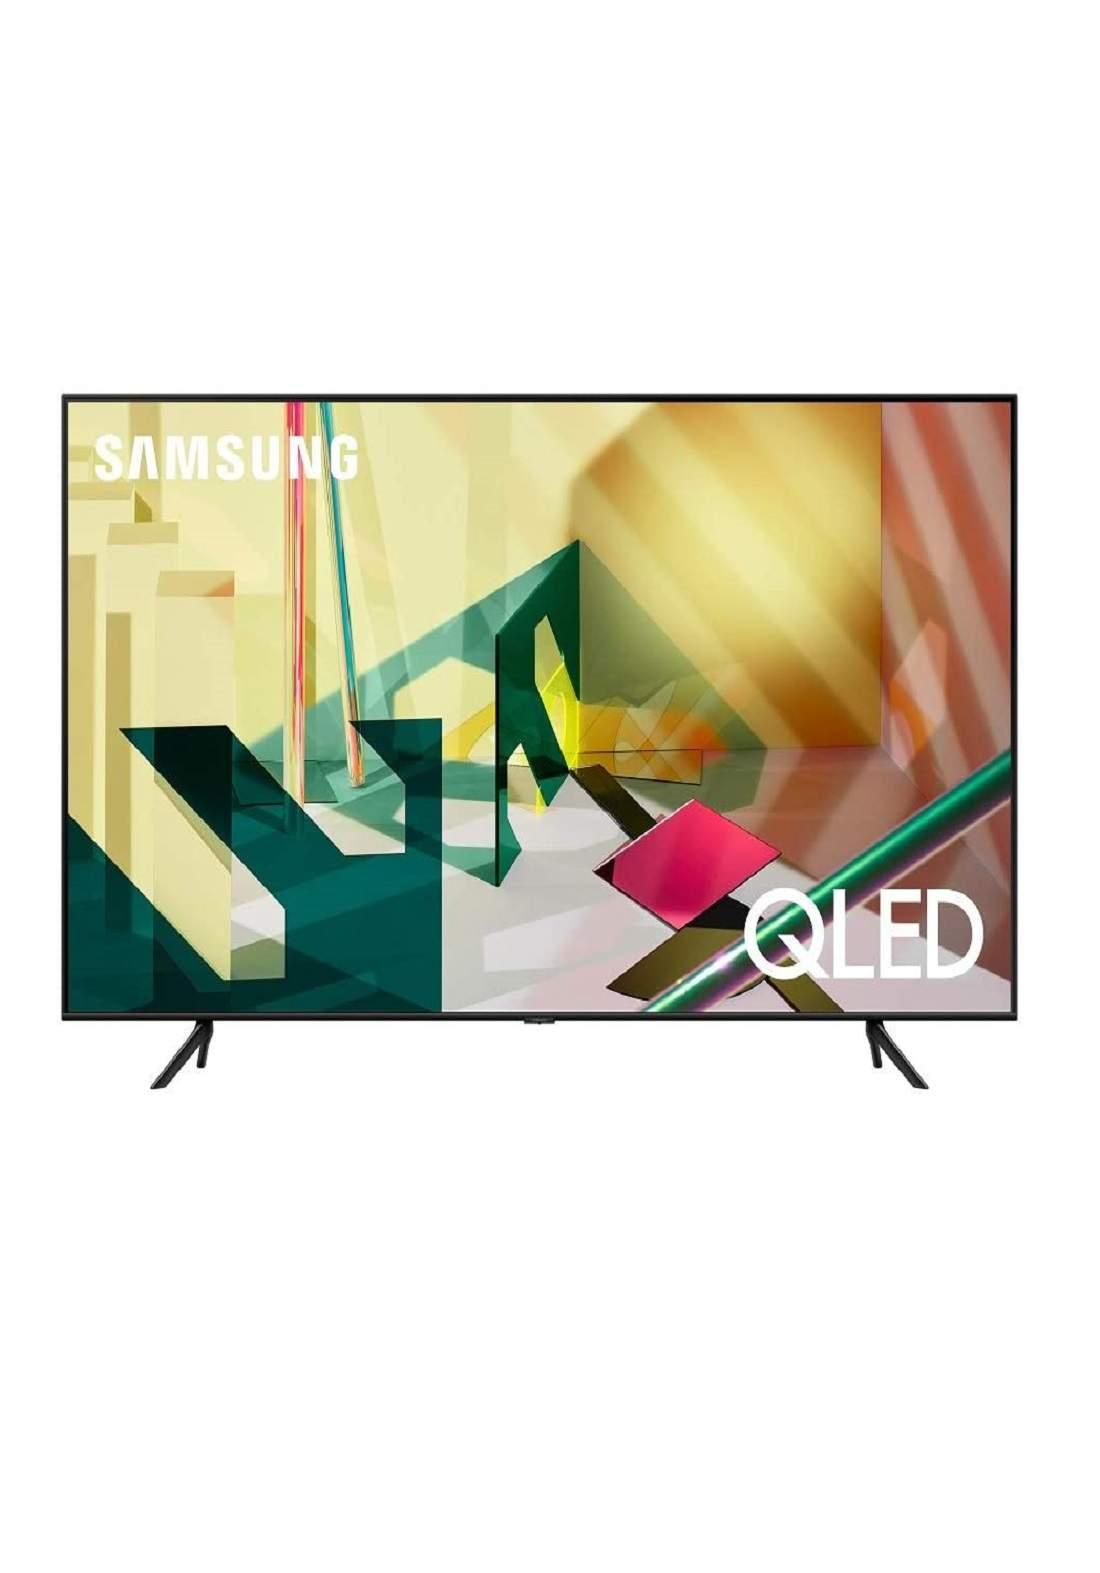 Samsung Q70T QLED 4K UHD HDR Smart TV 65 شاشة تلفاز